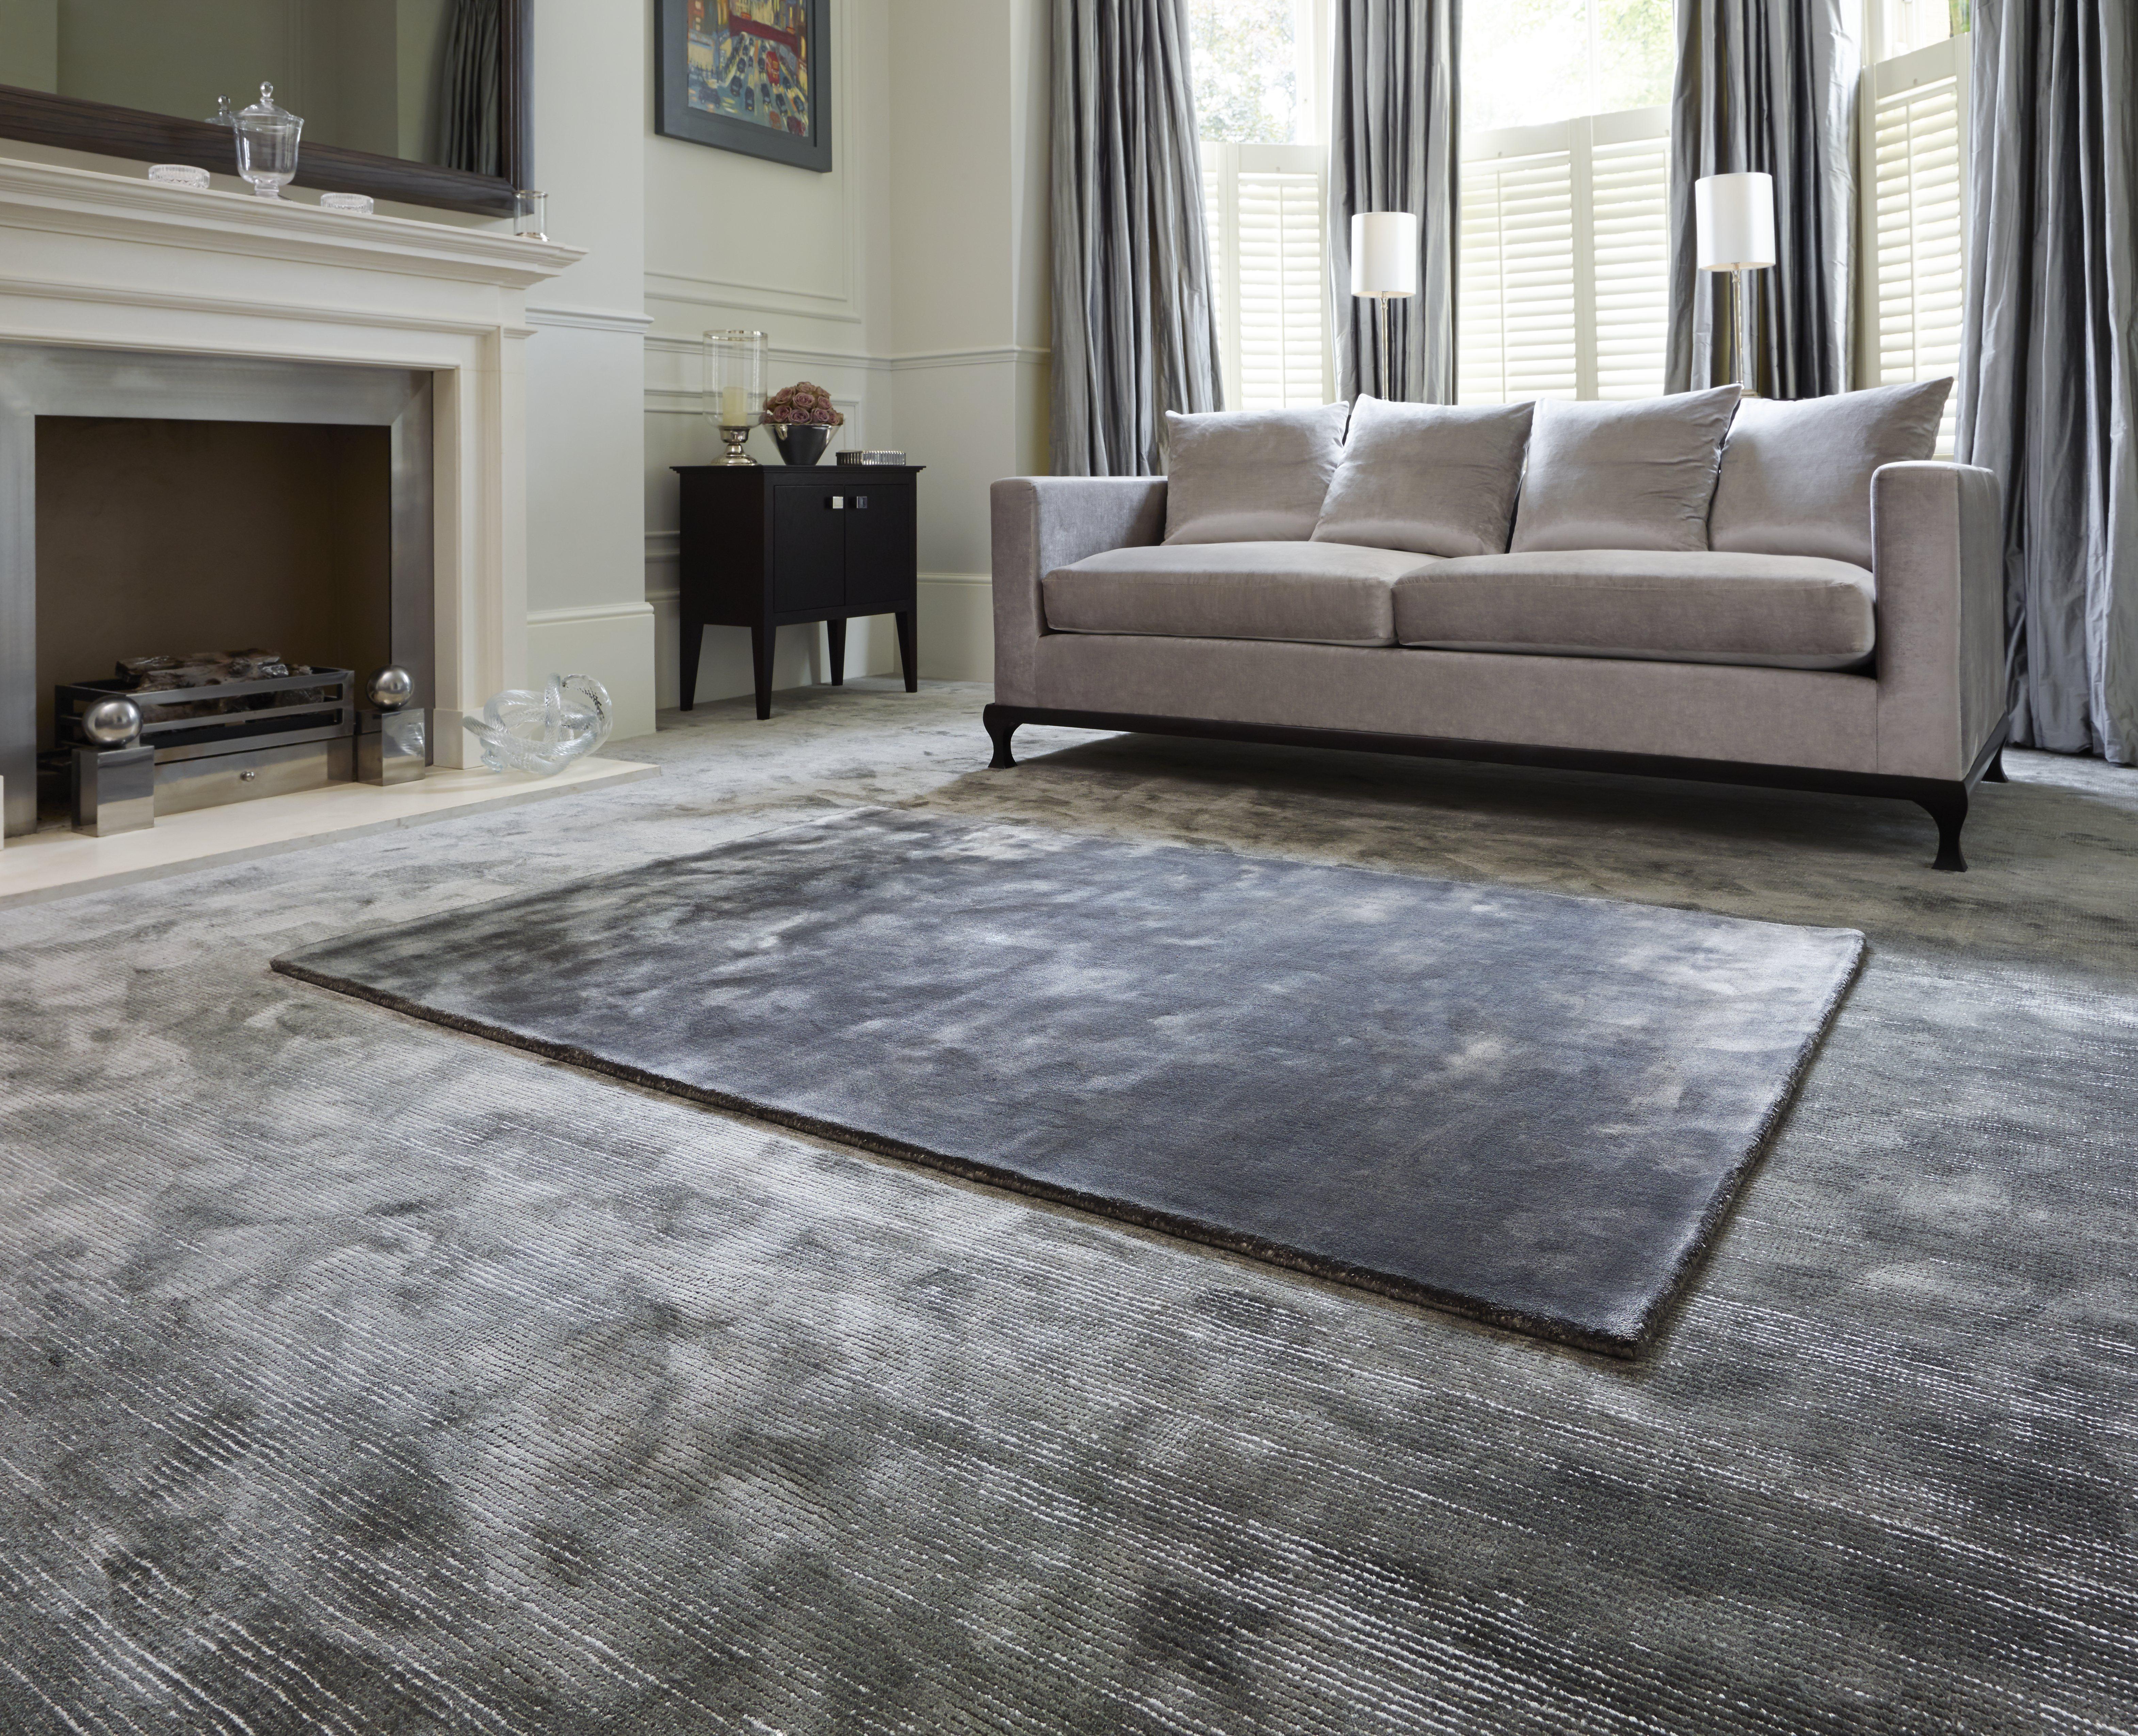 professionnel revetement textile ludovic bougo. Black Bedroom Furniture Sets. Home Design Ideas